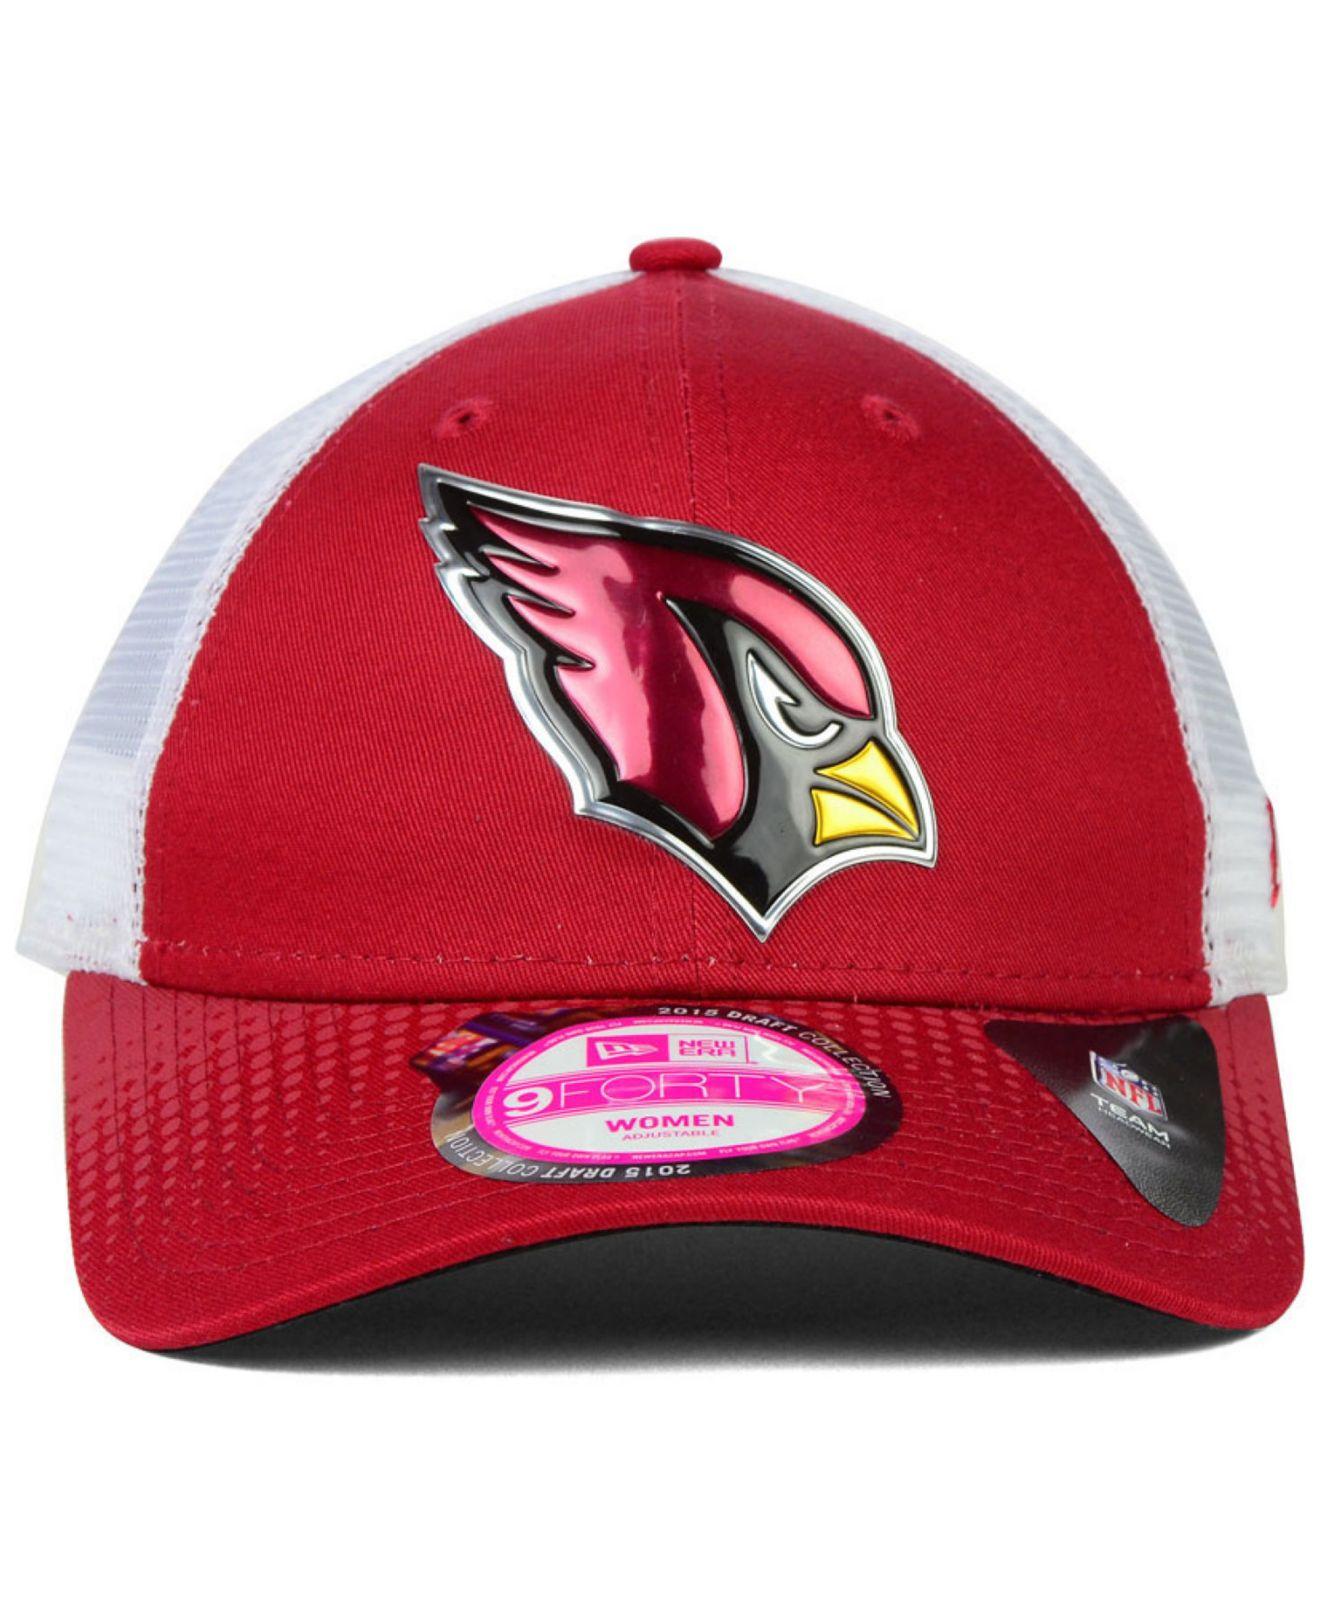 Lyst - KTZ Women s Arizona Cardinals Draft 9forty Cap in Red 2d3363ddc6